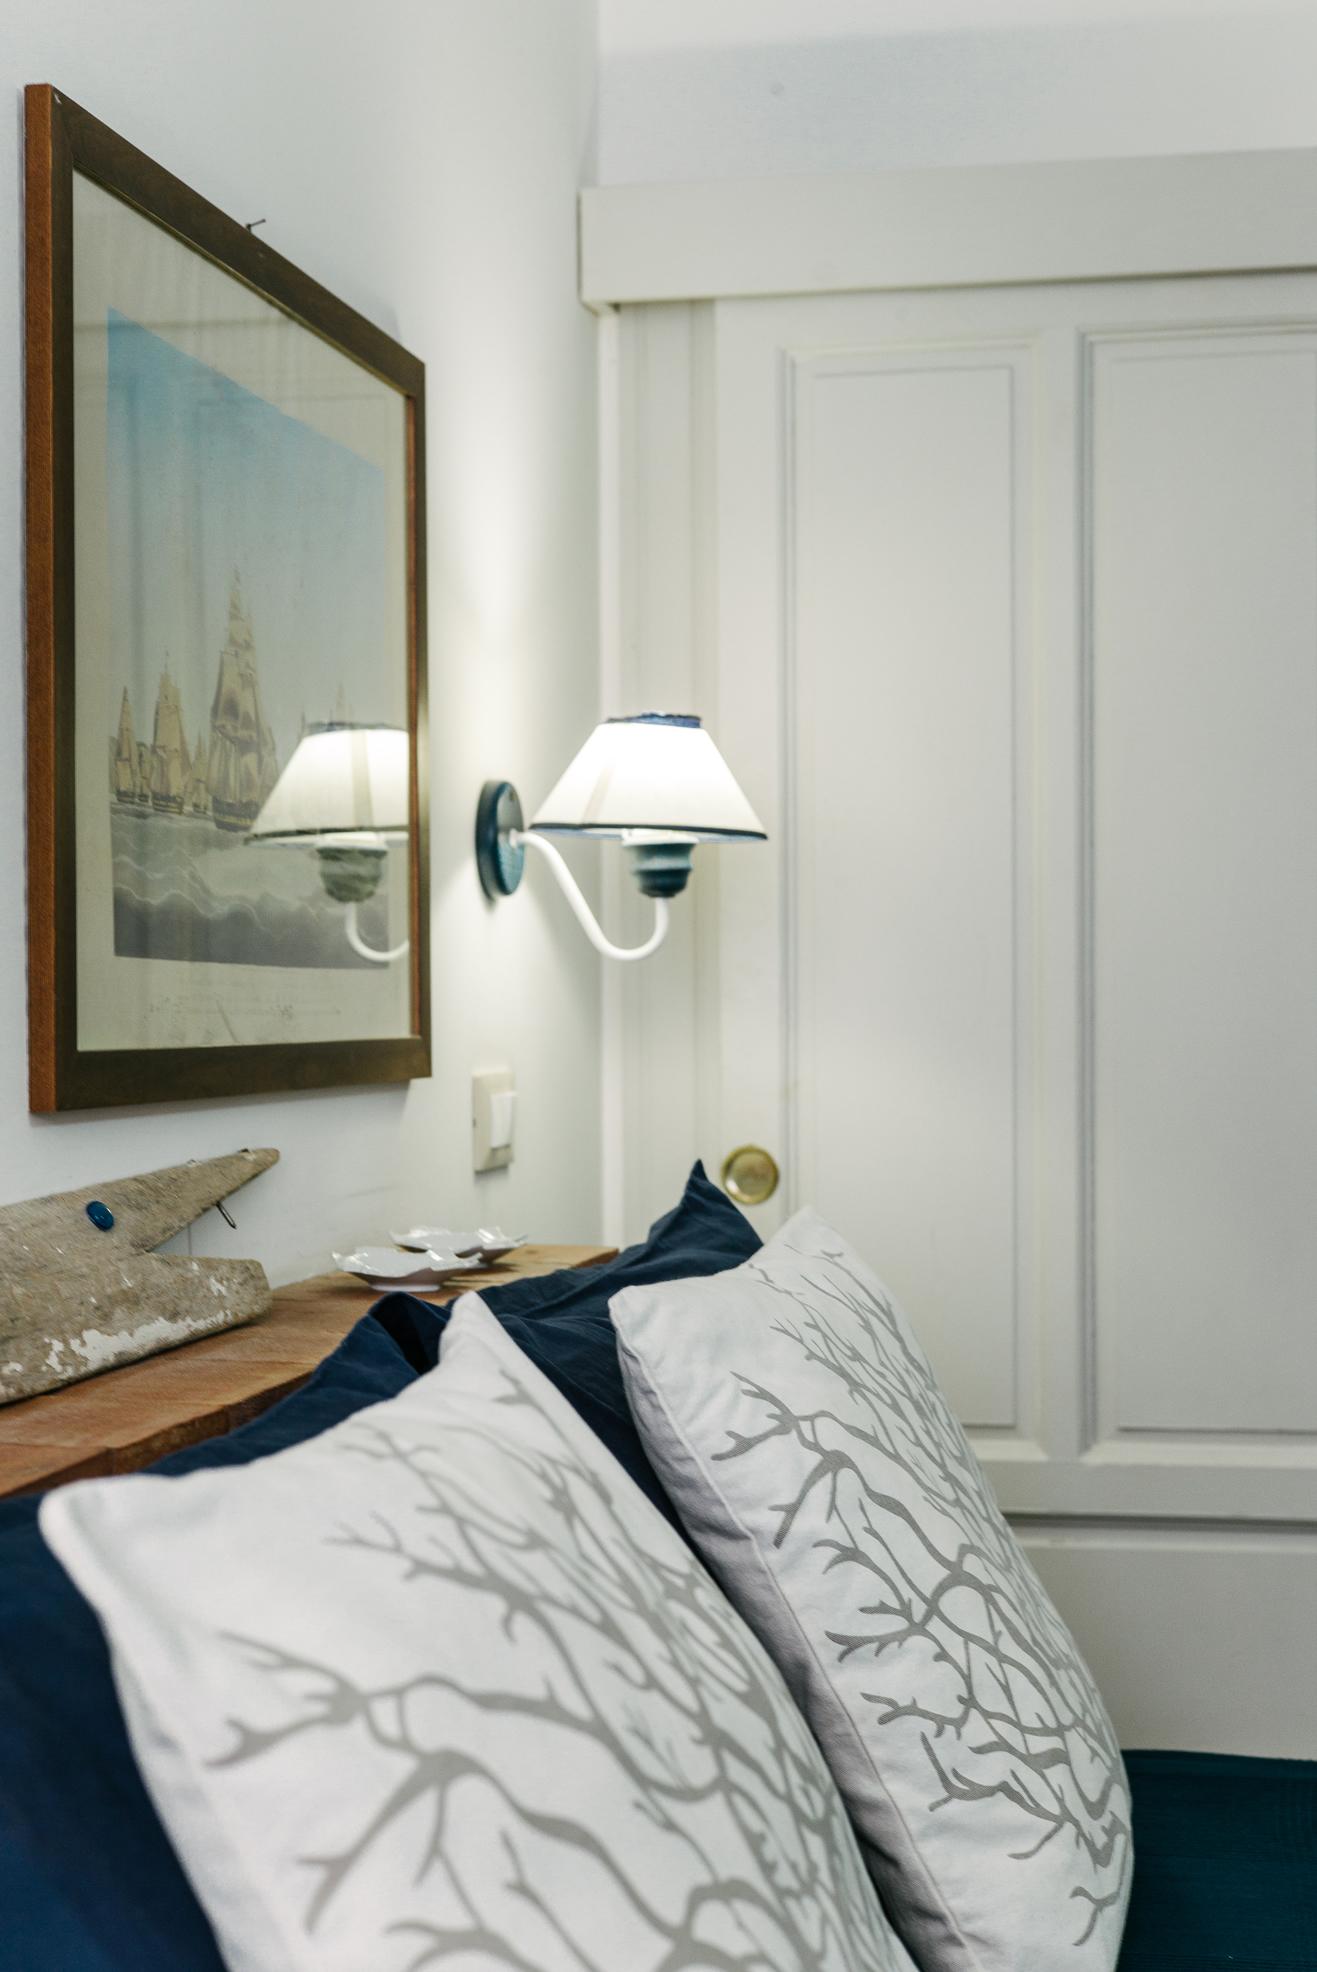 12sampieri-casa-vacanze-sicilia-appartamento-sicily-holiday-apartment-casa-del-pescatore-italia-italy.jpg